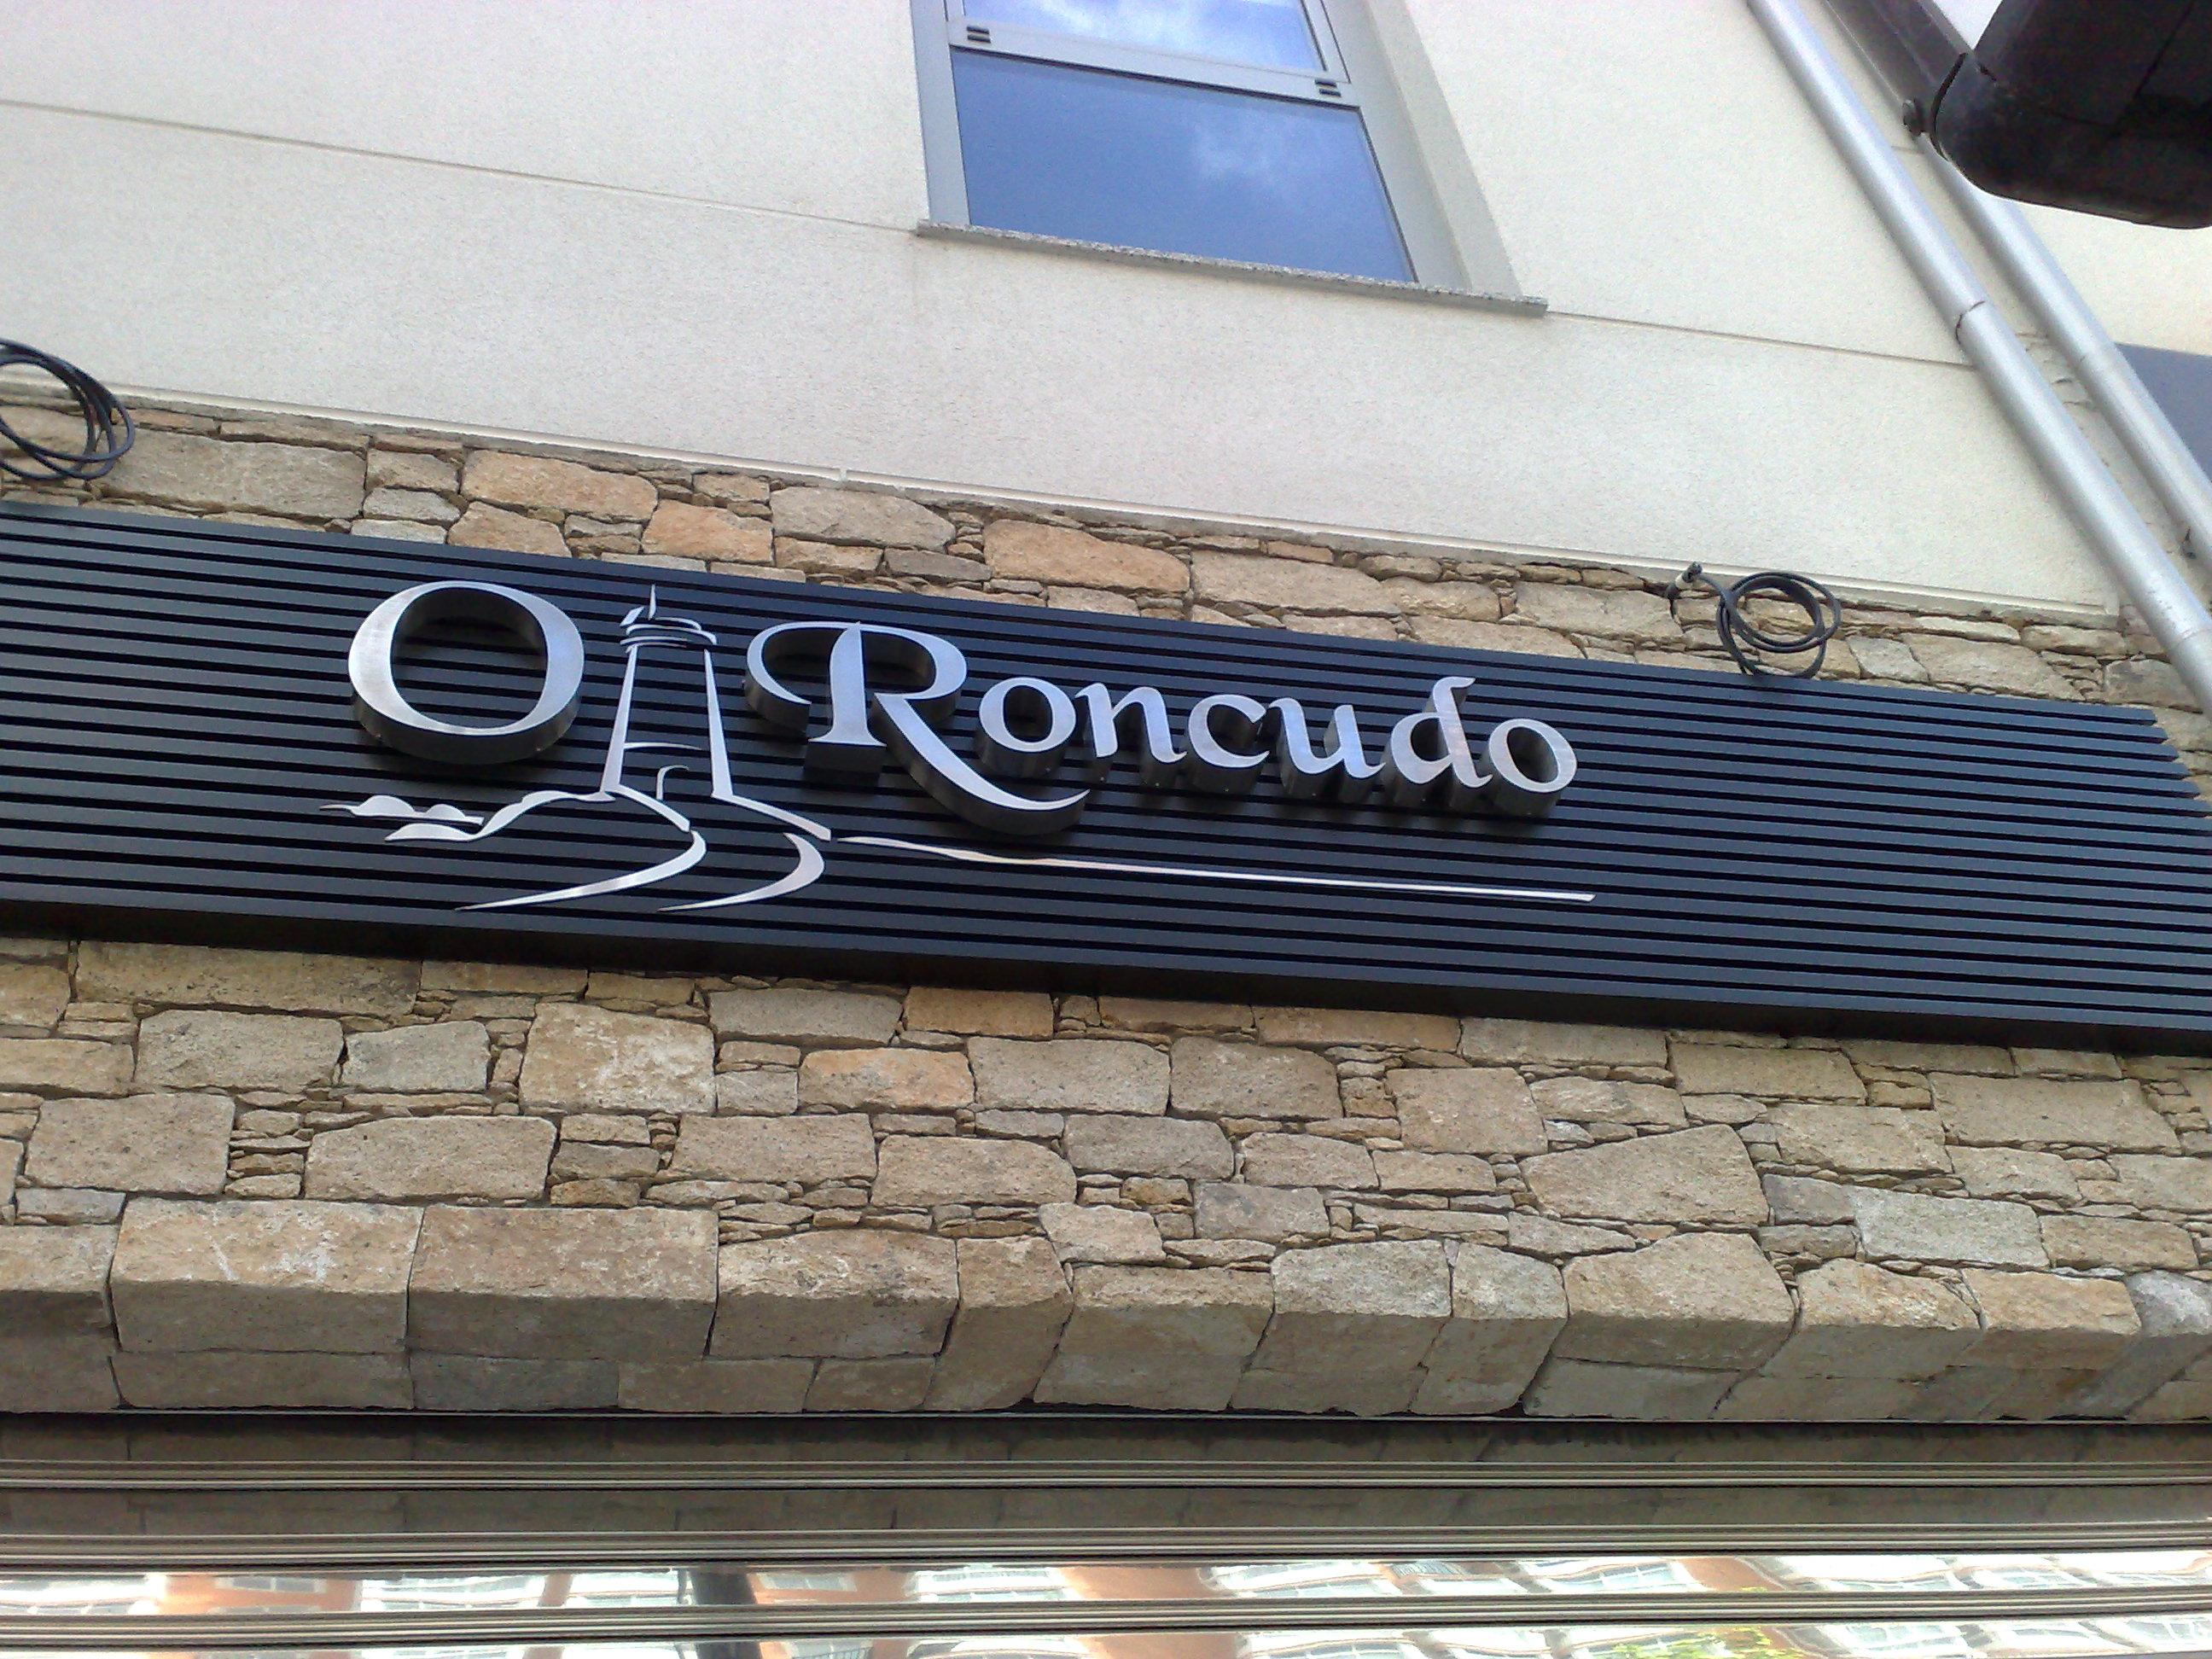 http://luzcoruna.es/wp-content/uploads/2020/03/07052010064-O-Roncudo.jpg